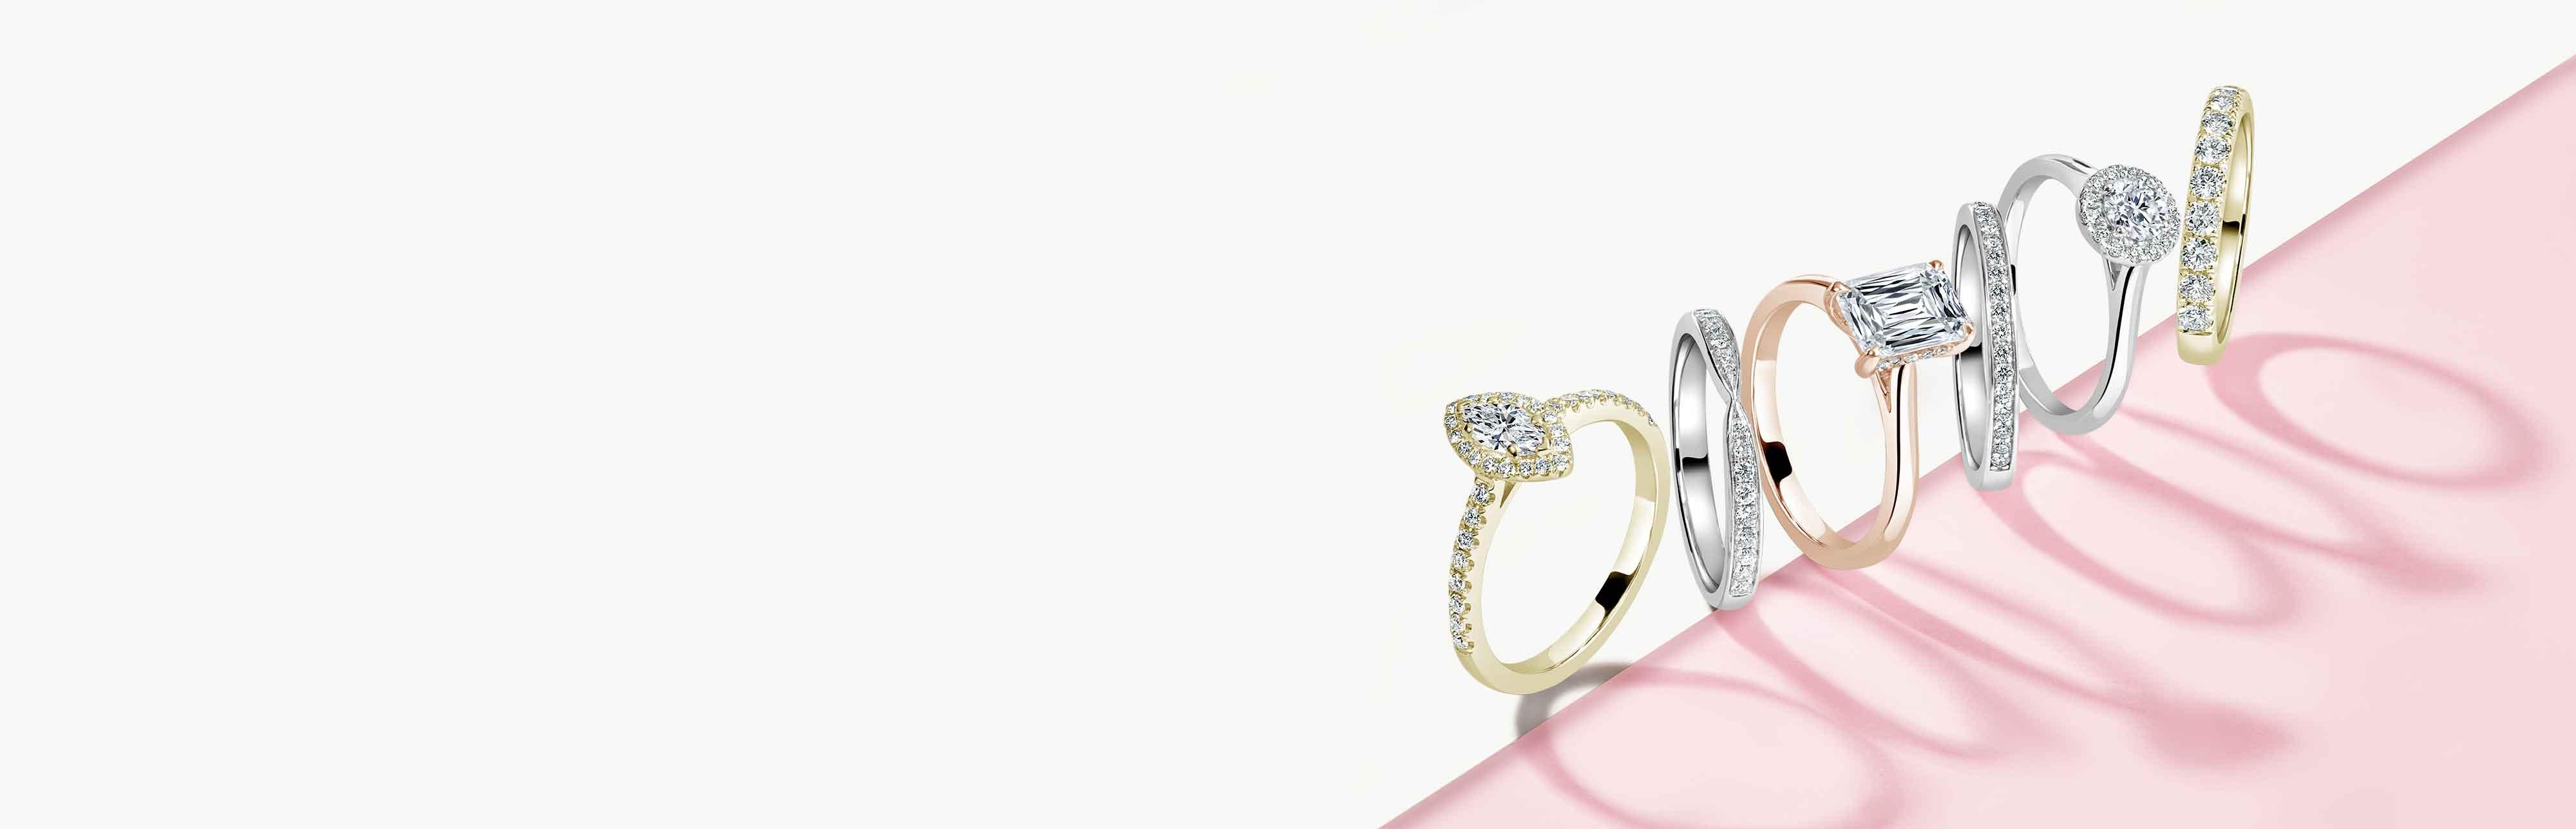 Platinum Princess Cut Engagement Rings - Steven Stone